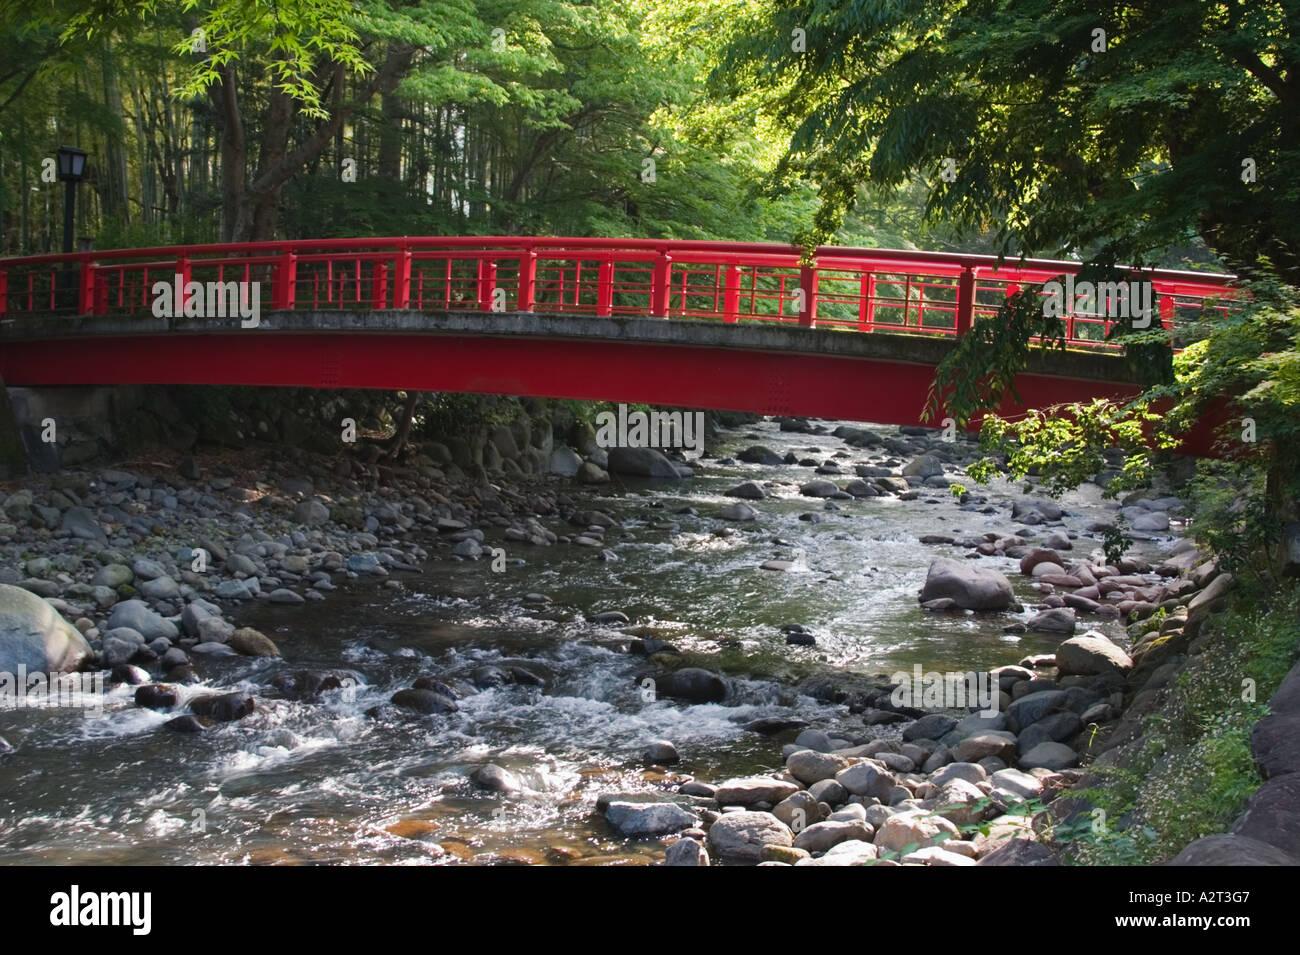 Red arched bridge over the Katsuragawa River Shuzenji Shizuoka prefecture Izu Peninsula JapanStock Photo